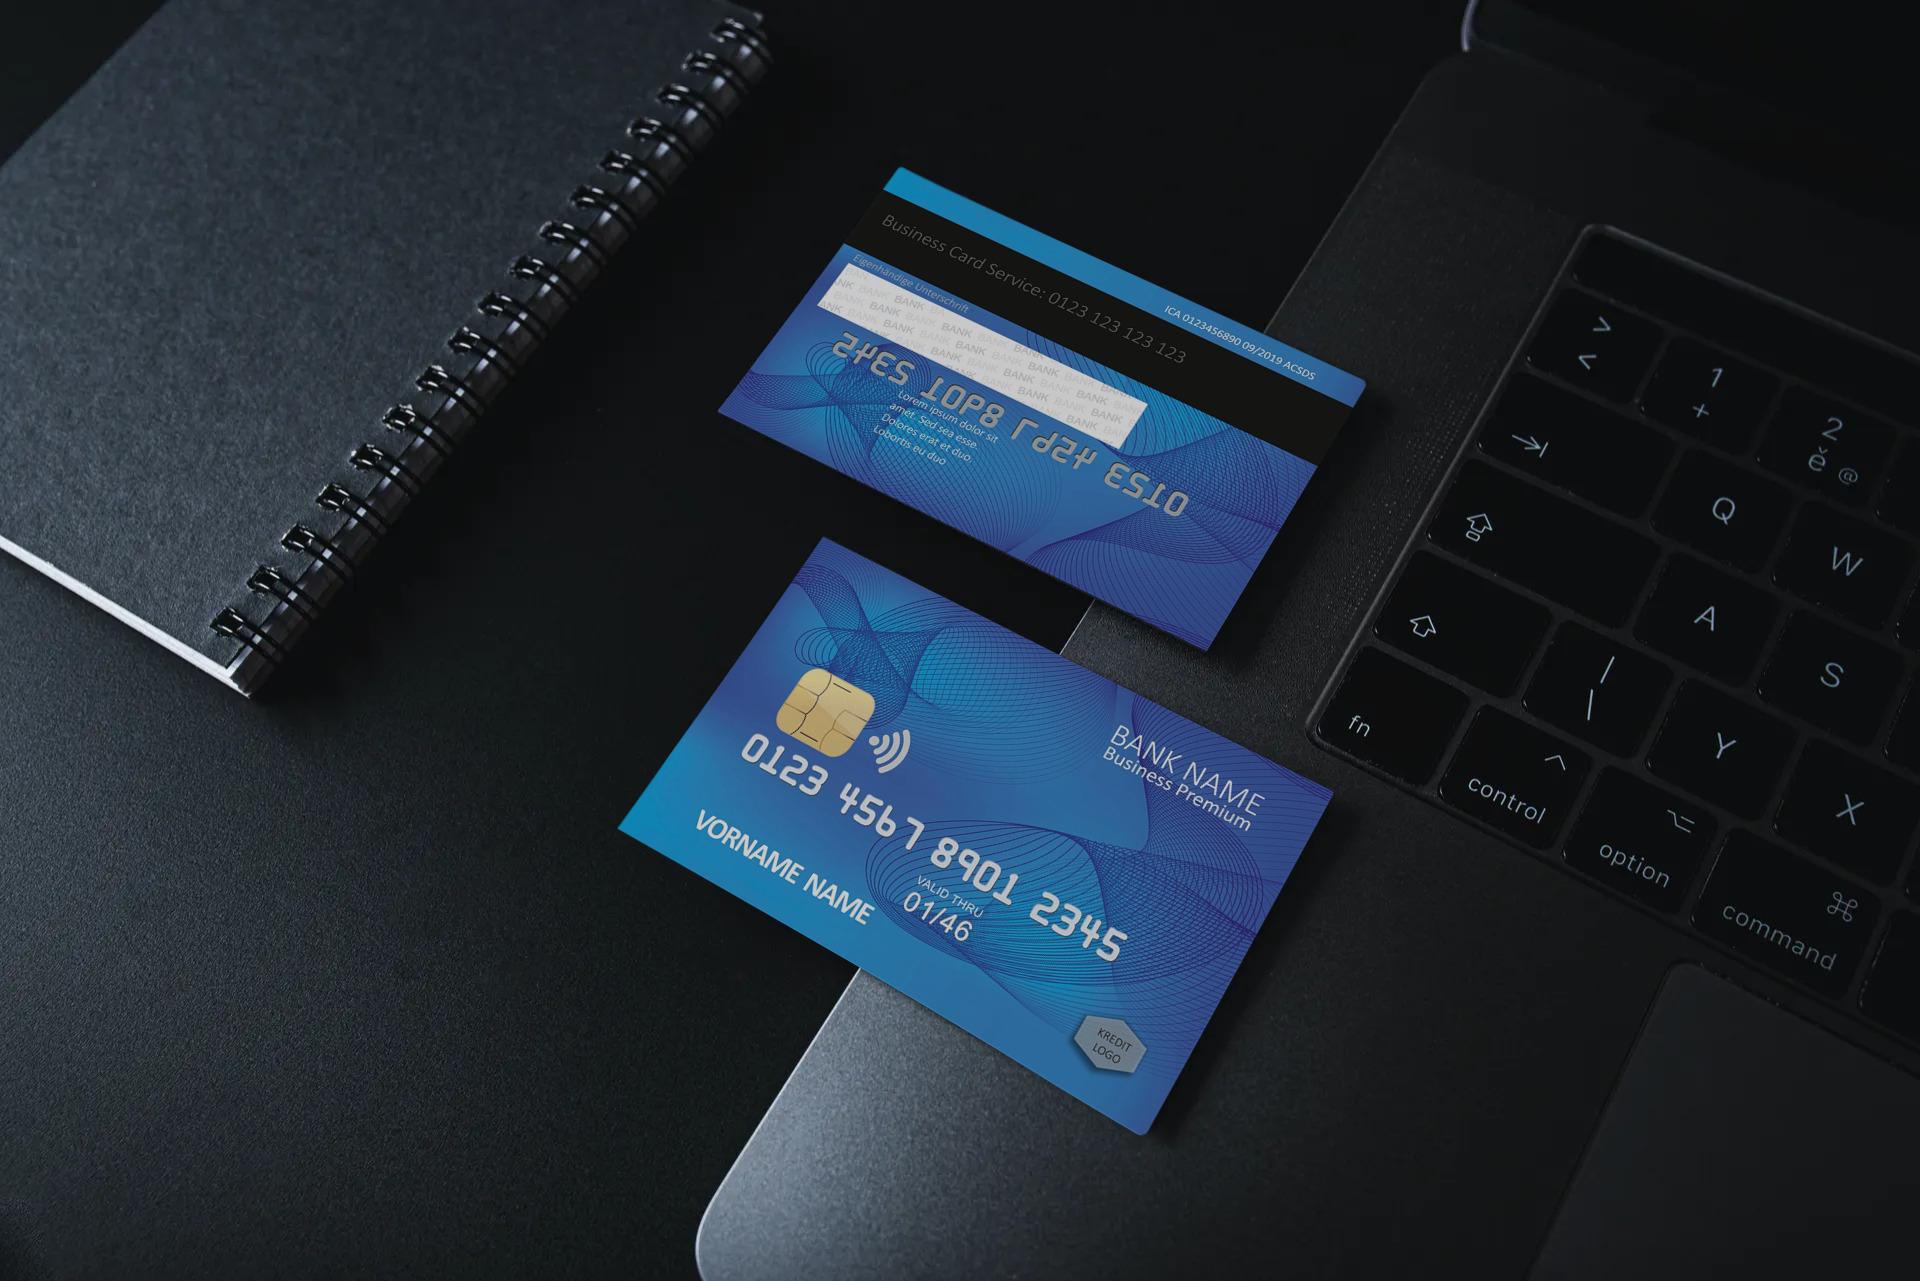 Kreditkarte Designvorlage KC-2019-000120 - TEXTAG GROUP